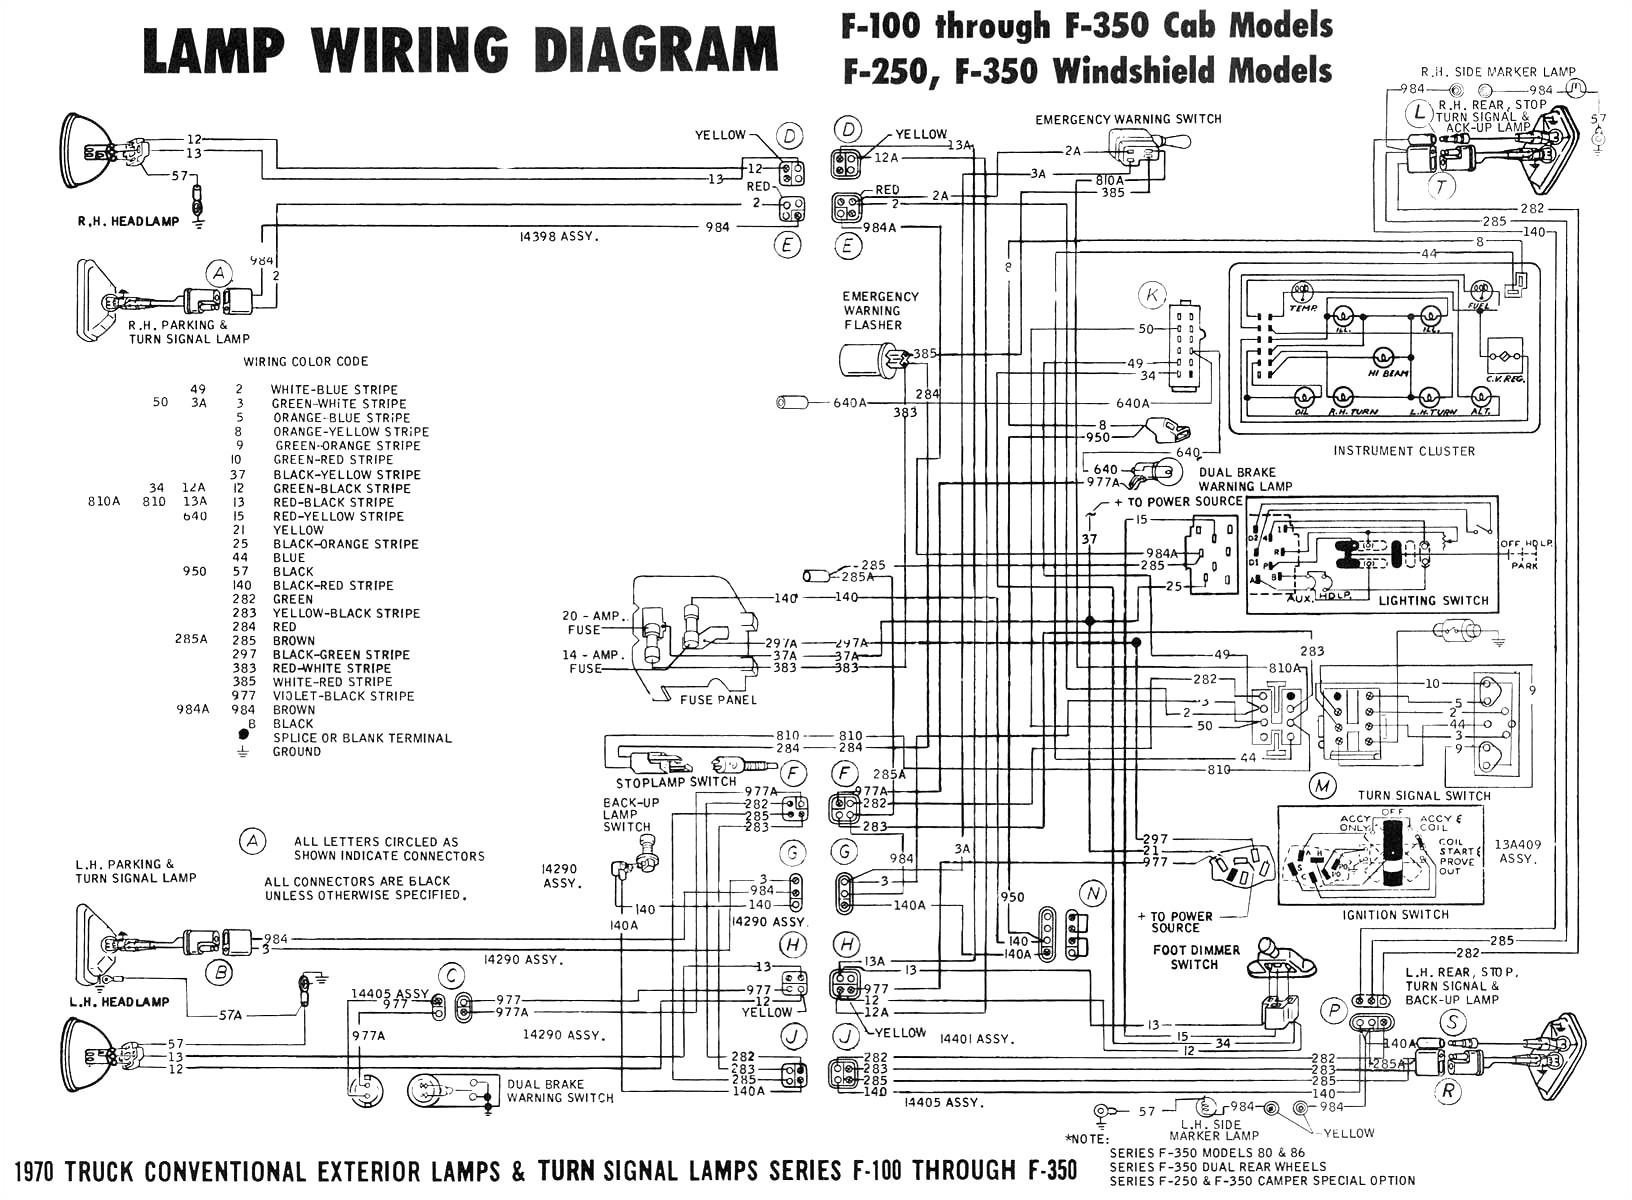 2013 ford e250 wiring diagram wiring diagram centre 05 ford e 250 trailer wiring